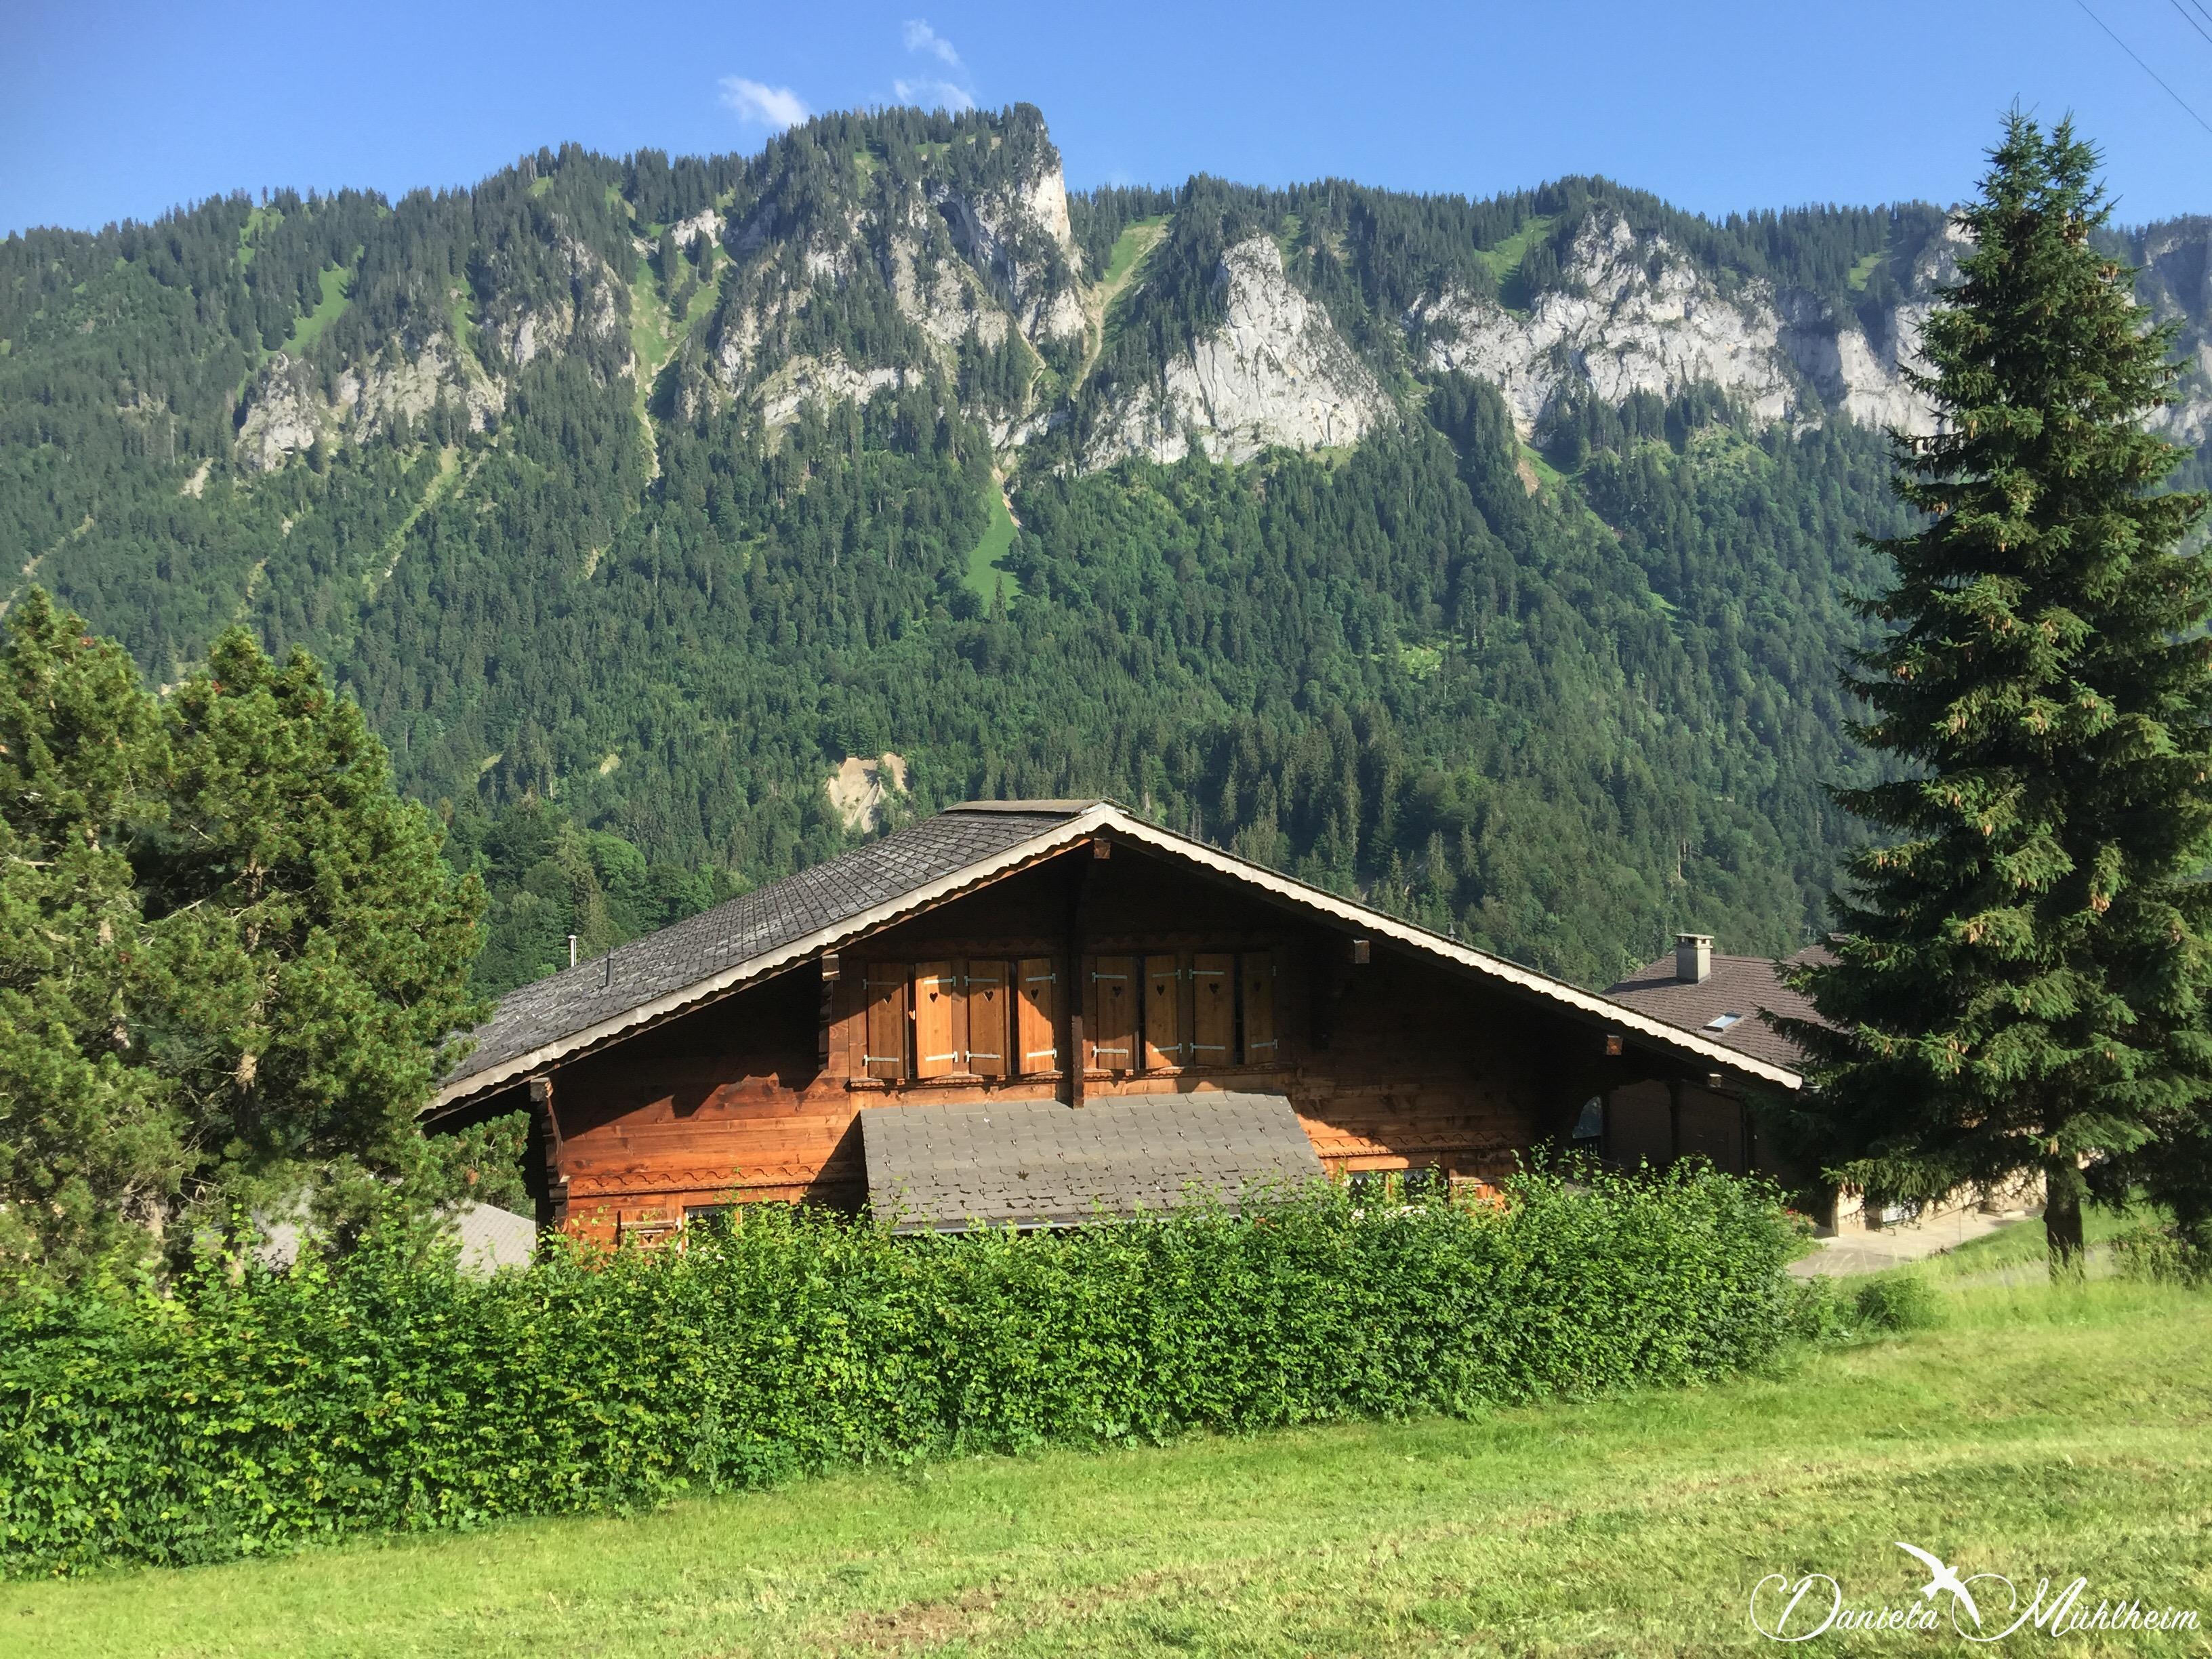 daniela, muehlheim, danielamühlheim, ladybird, exploring, earth, abundance, Switzerland, Alps